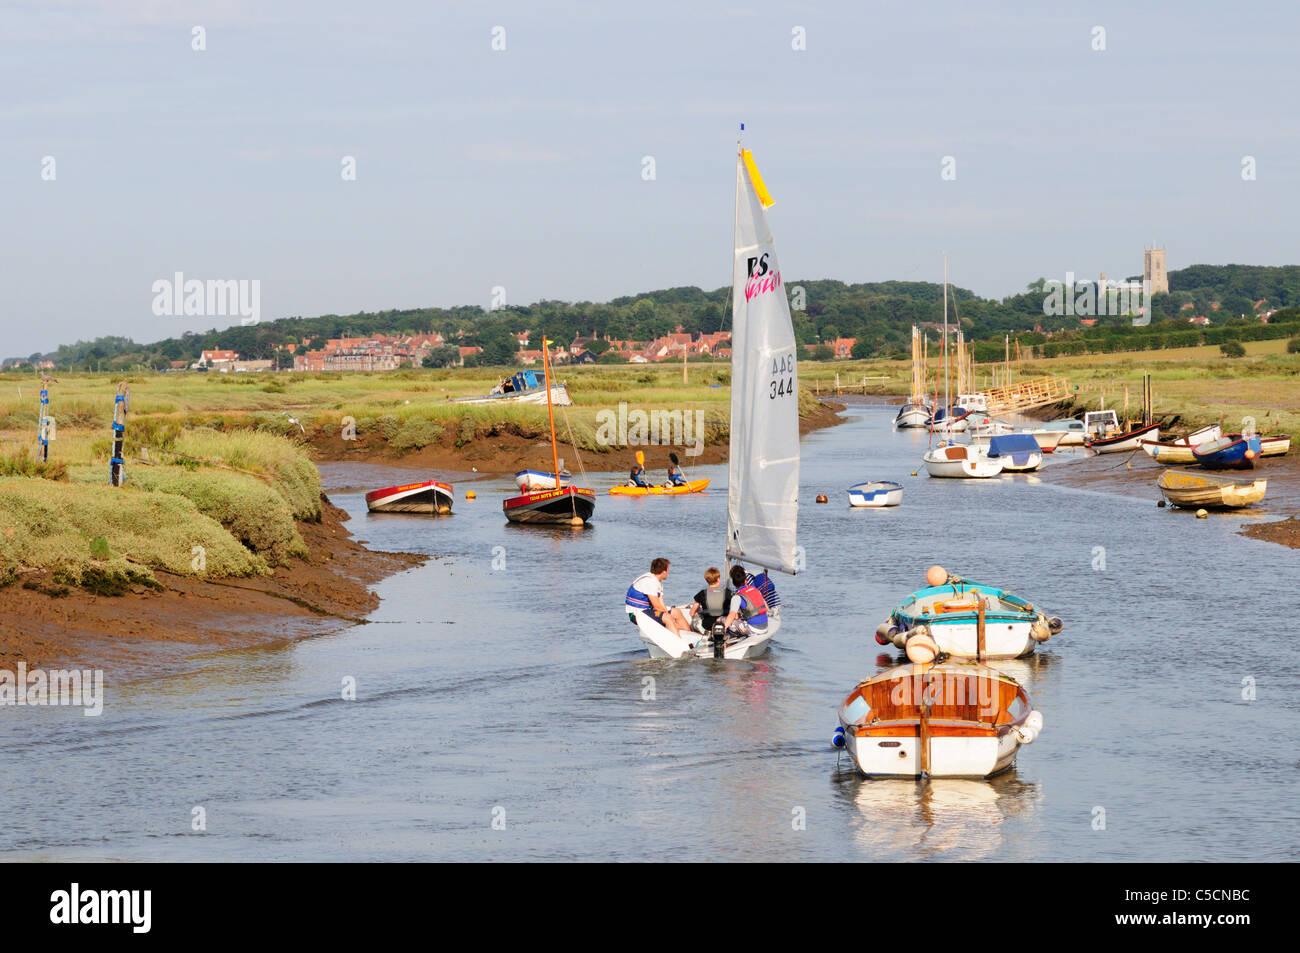 Dinghy Sailing in Morston Creek, Norfolk, England, UK - Stock Image